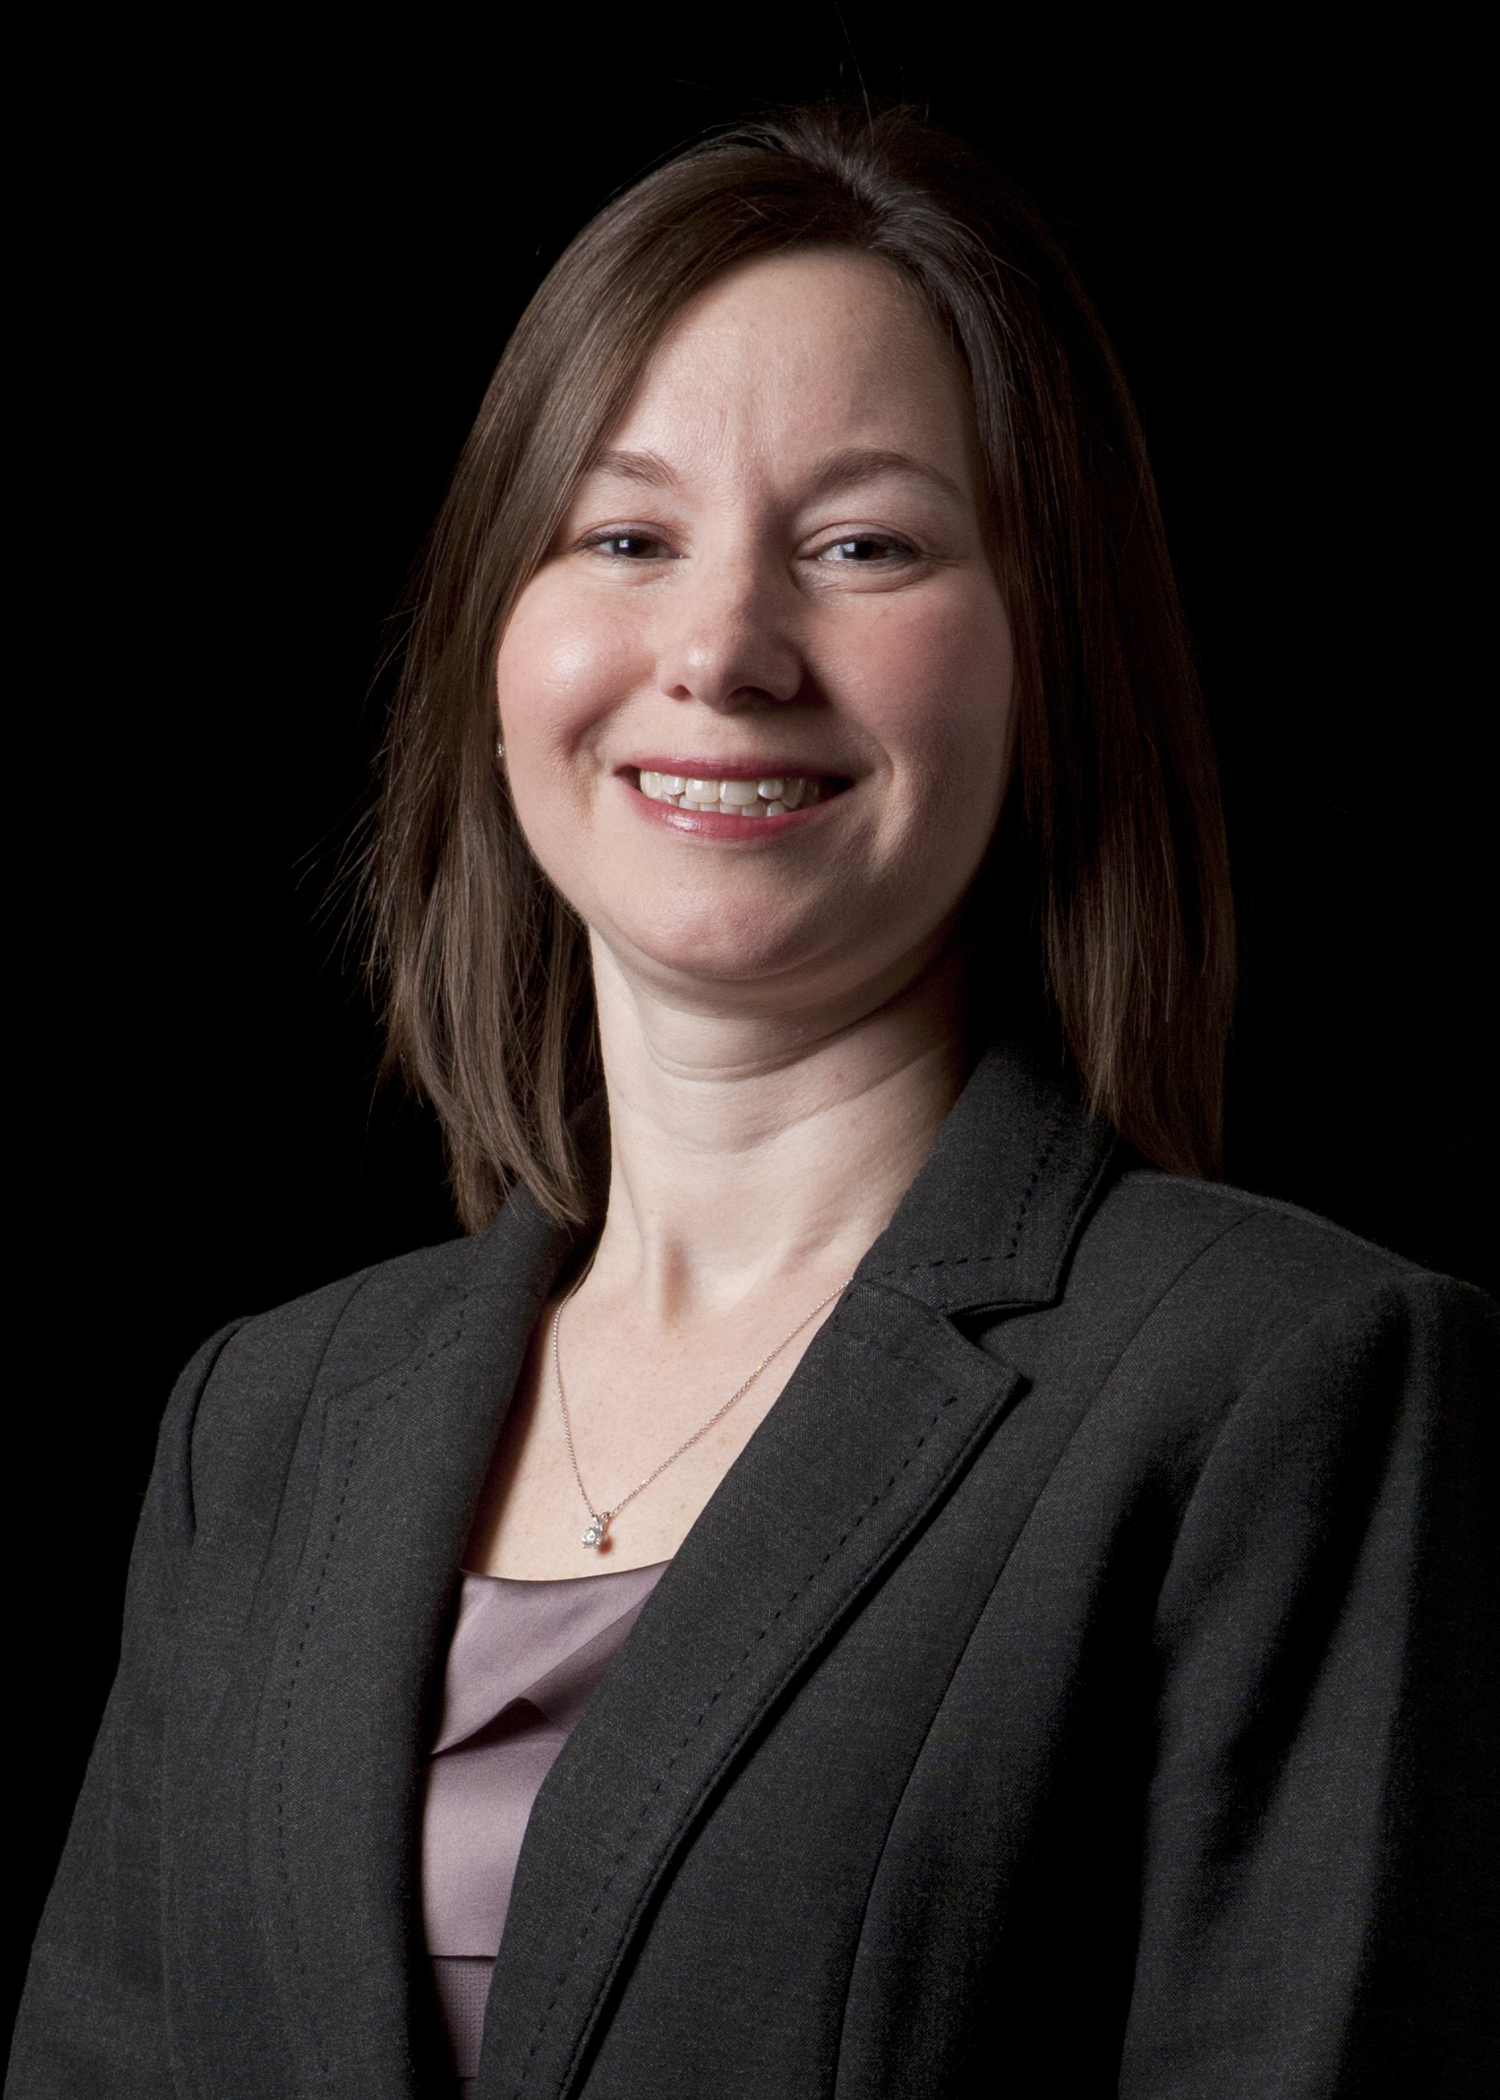 Jennifer Wintergerst ('99) selected to Leadership Louisville's Class of 2016